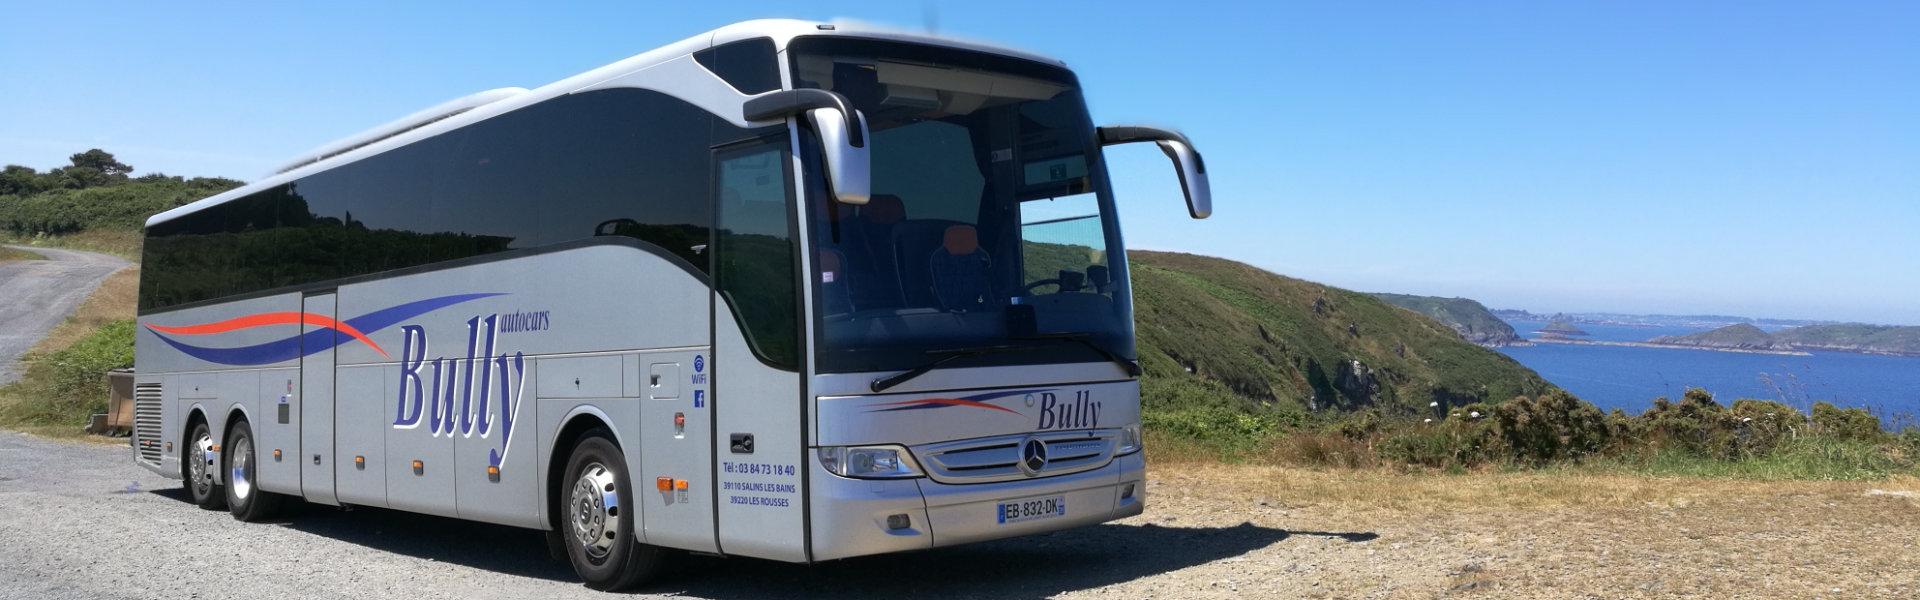 transport-tourisme-bus-jura